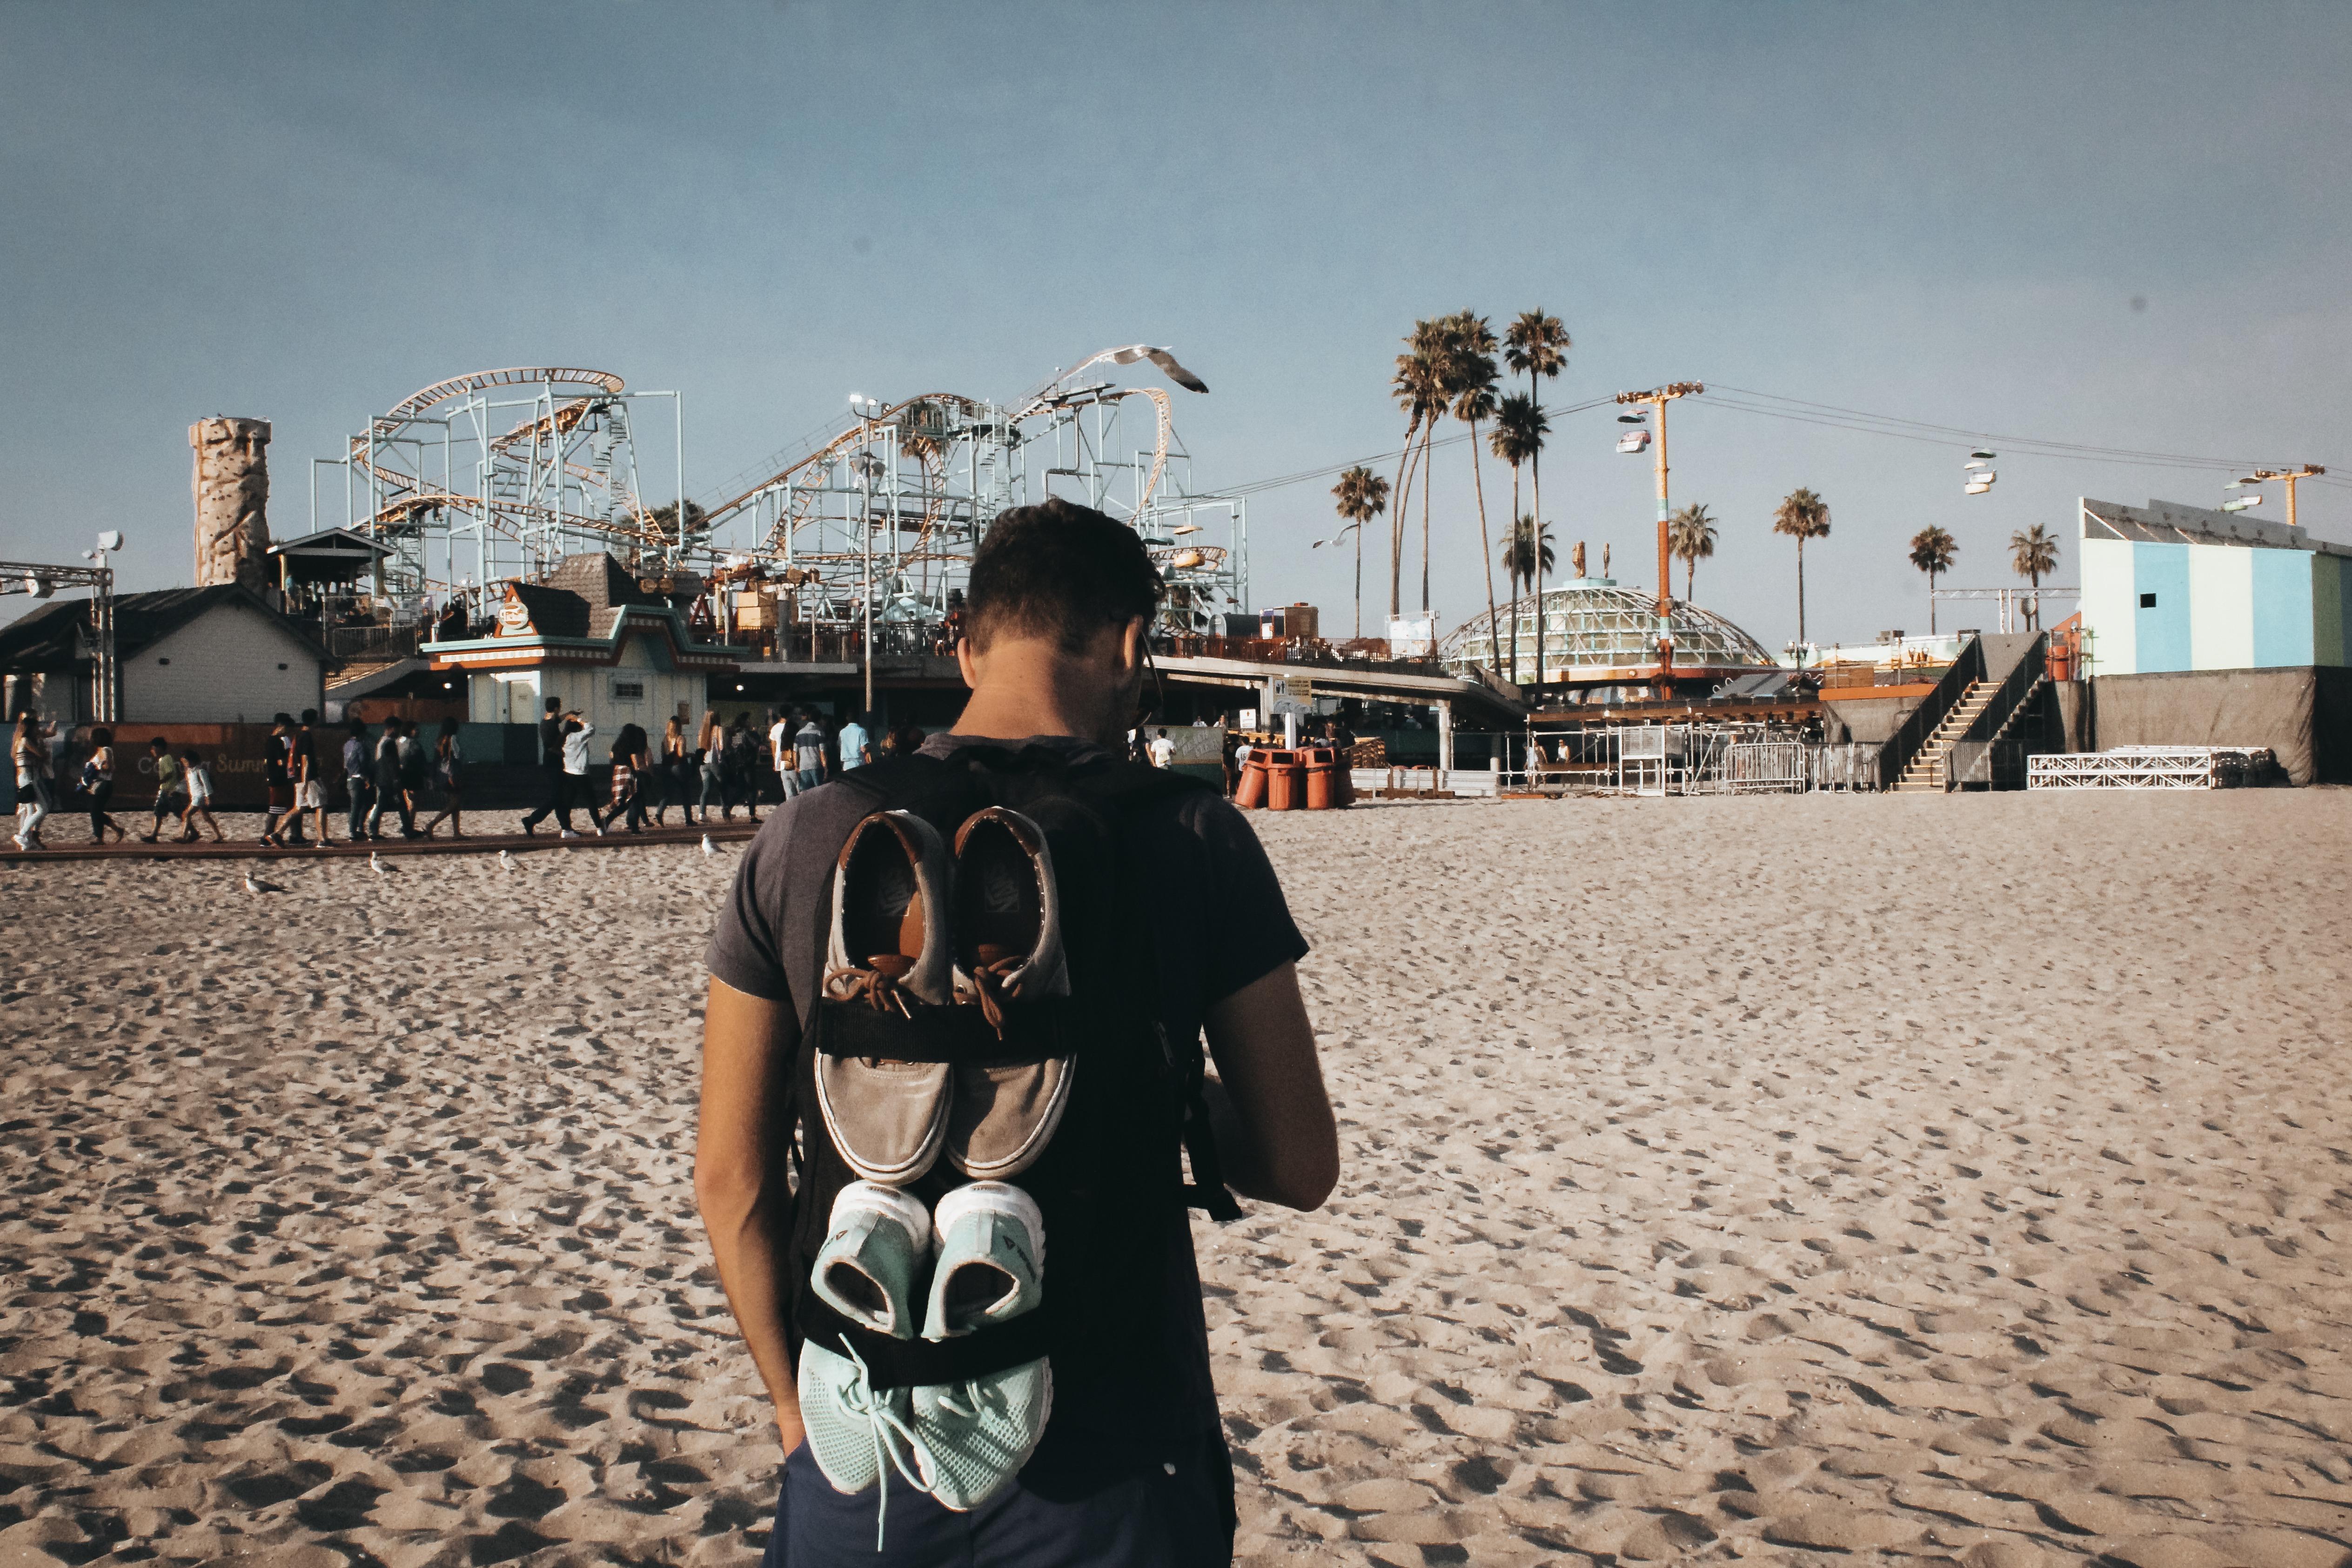 Man Standing in Beach Facing Rides